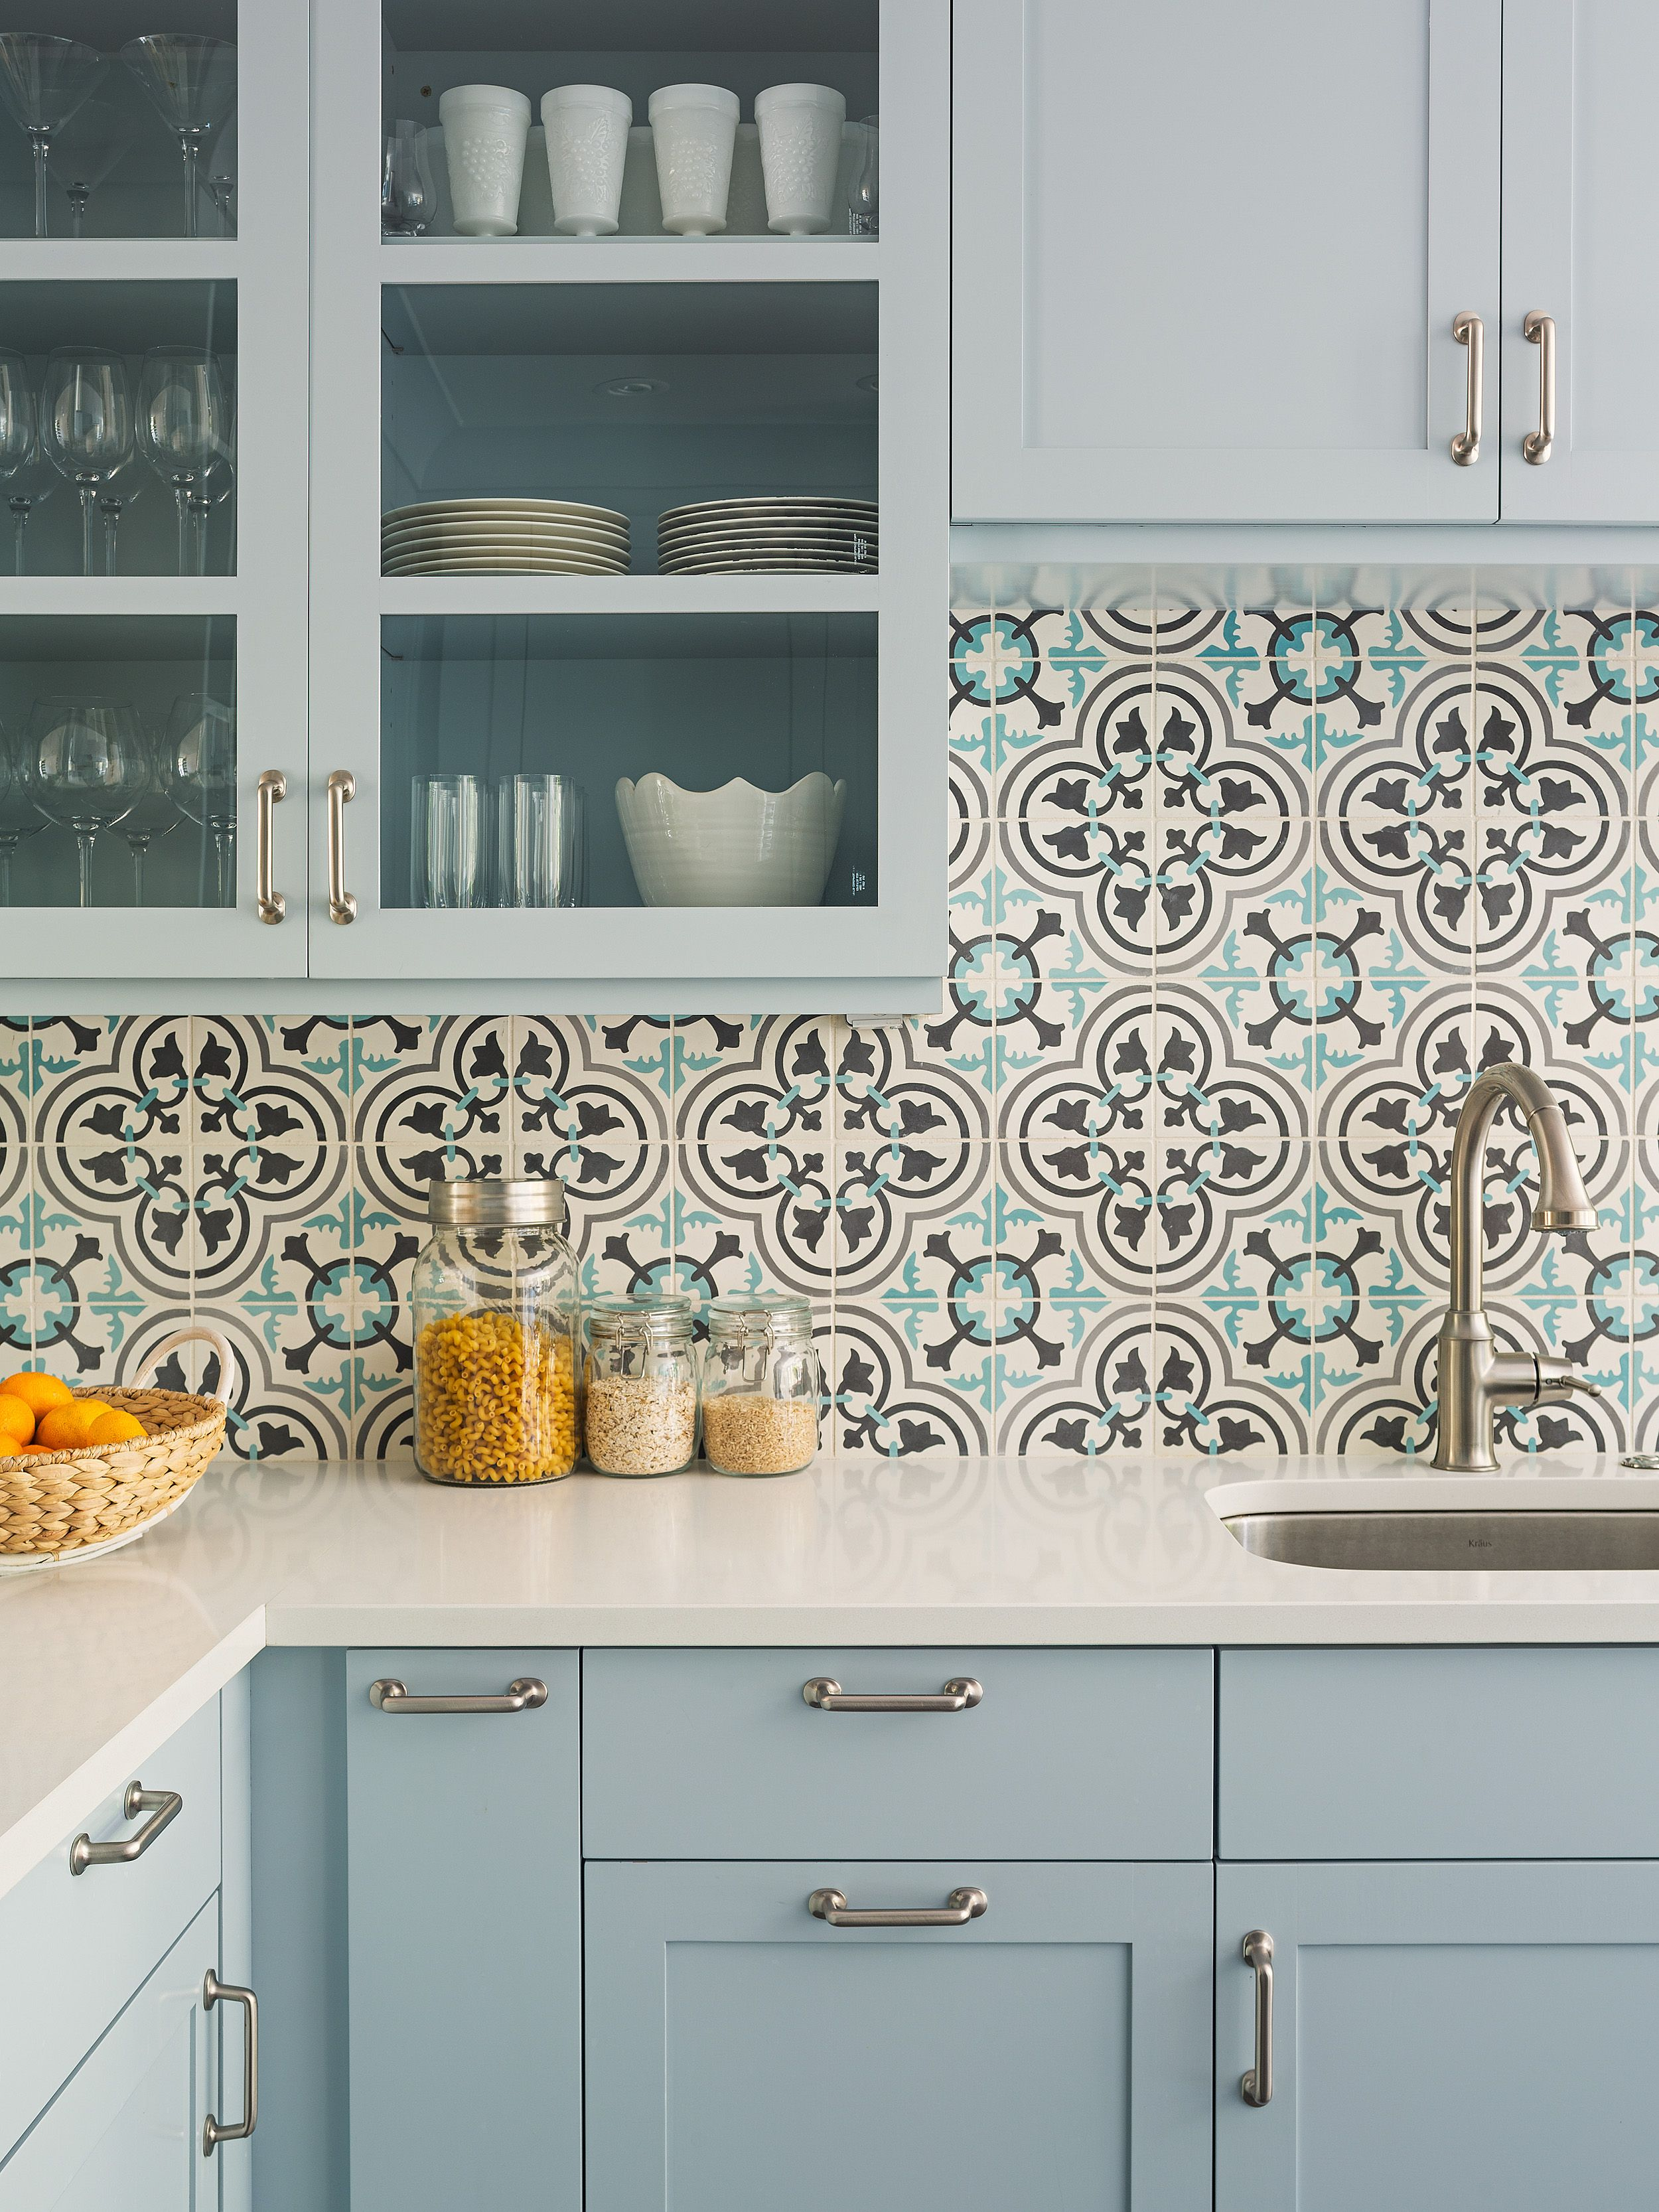 SOberter_PhiladelphiaKitchen_Cluny_Granada-Cement-Tile.jpg 2,500 ...